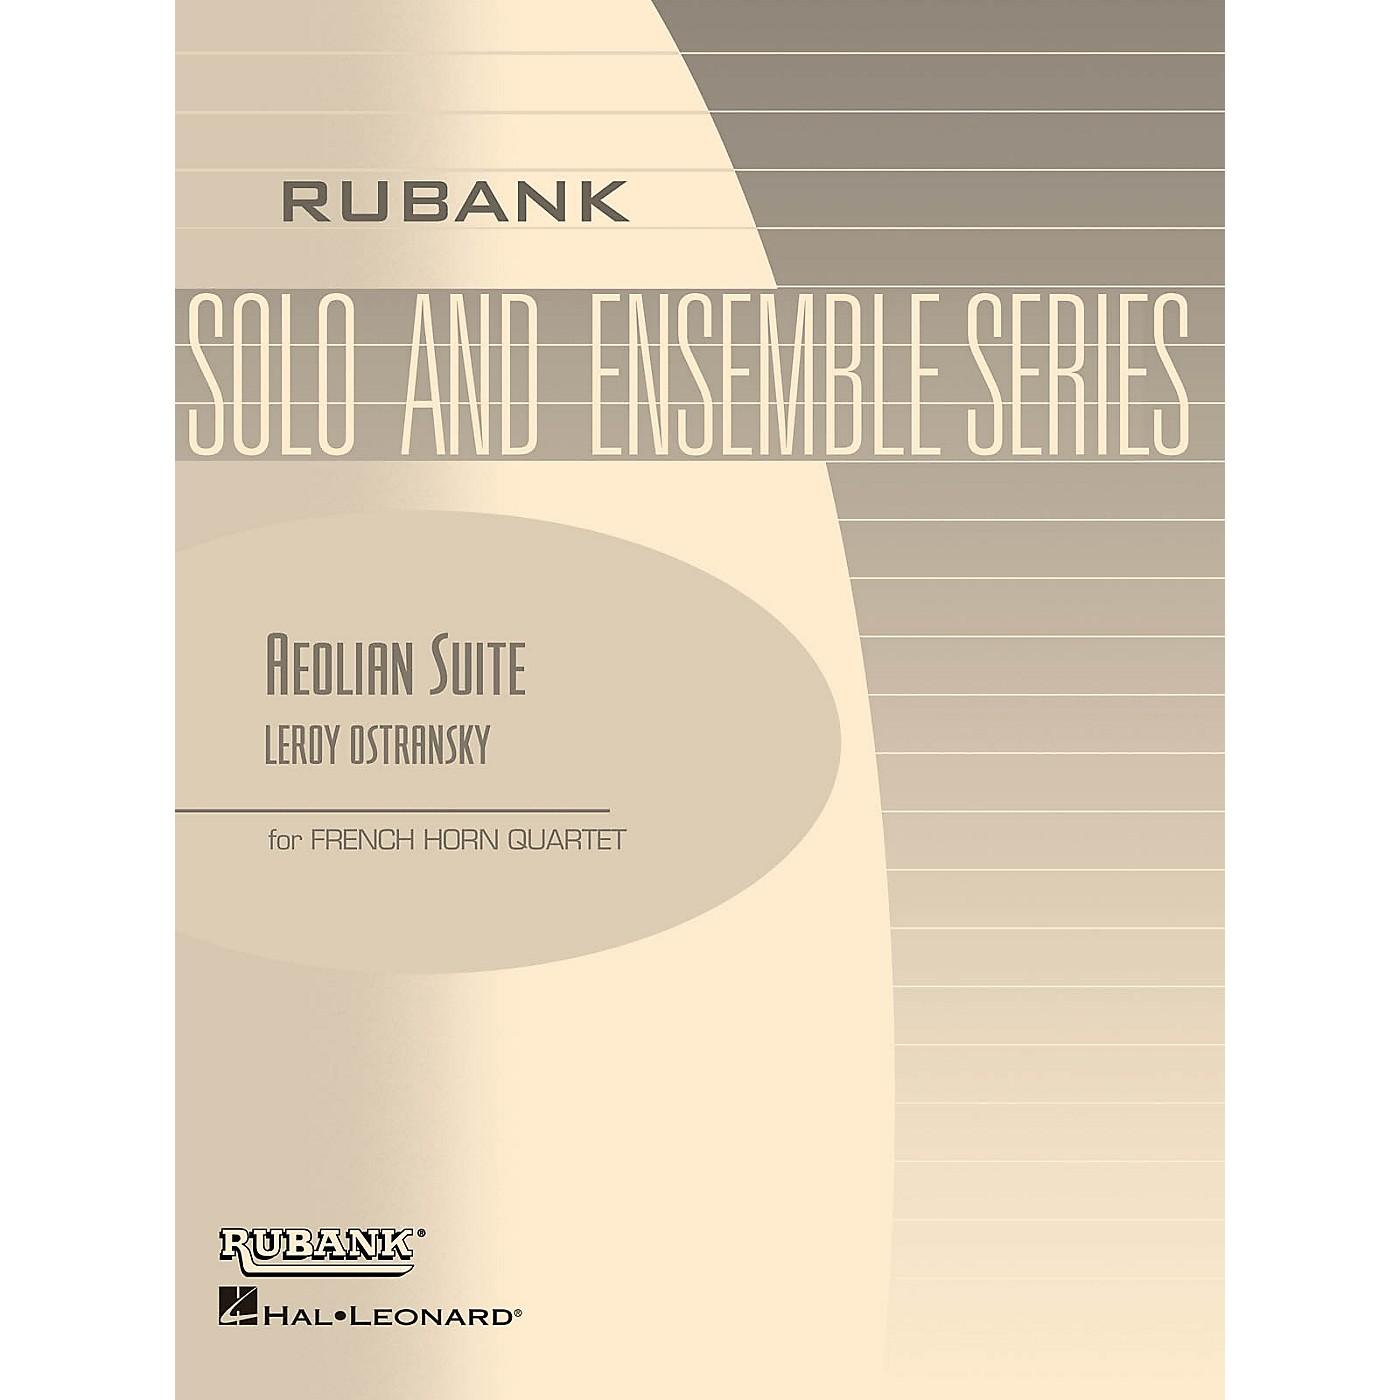 Rubank Publications Aeolian Suite (Horn Quartet - Grade 3) Rubank Solo/Ensemble Sheet Series thumbnail